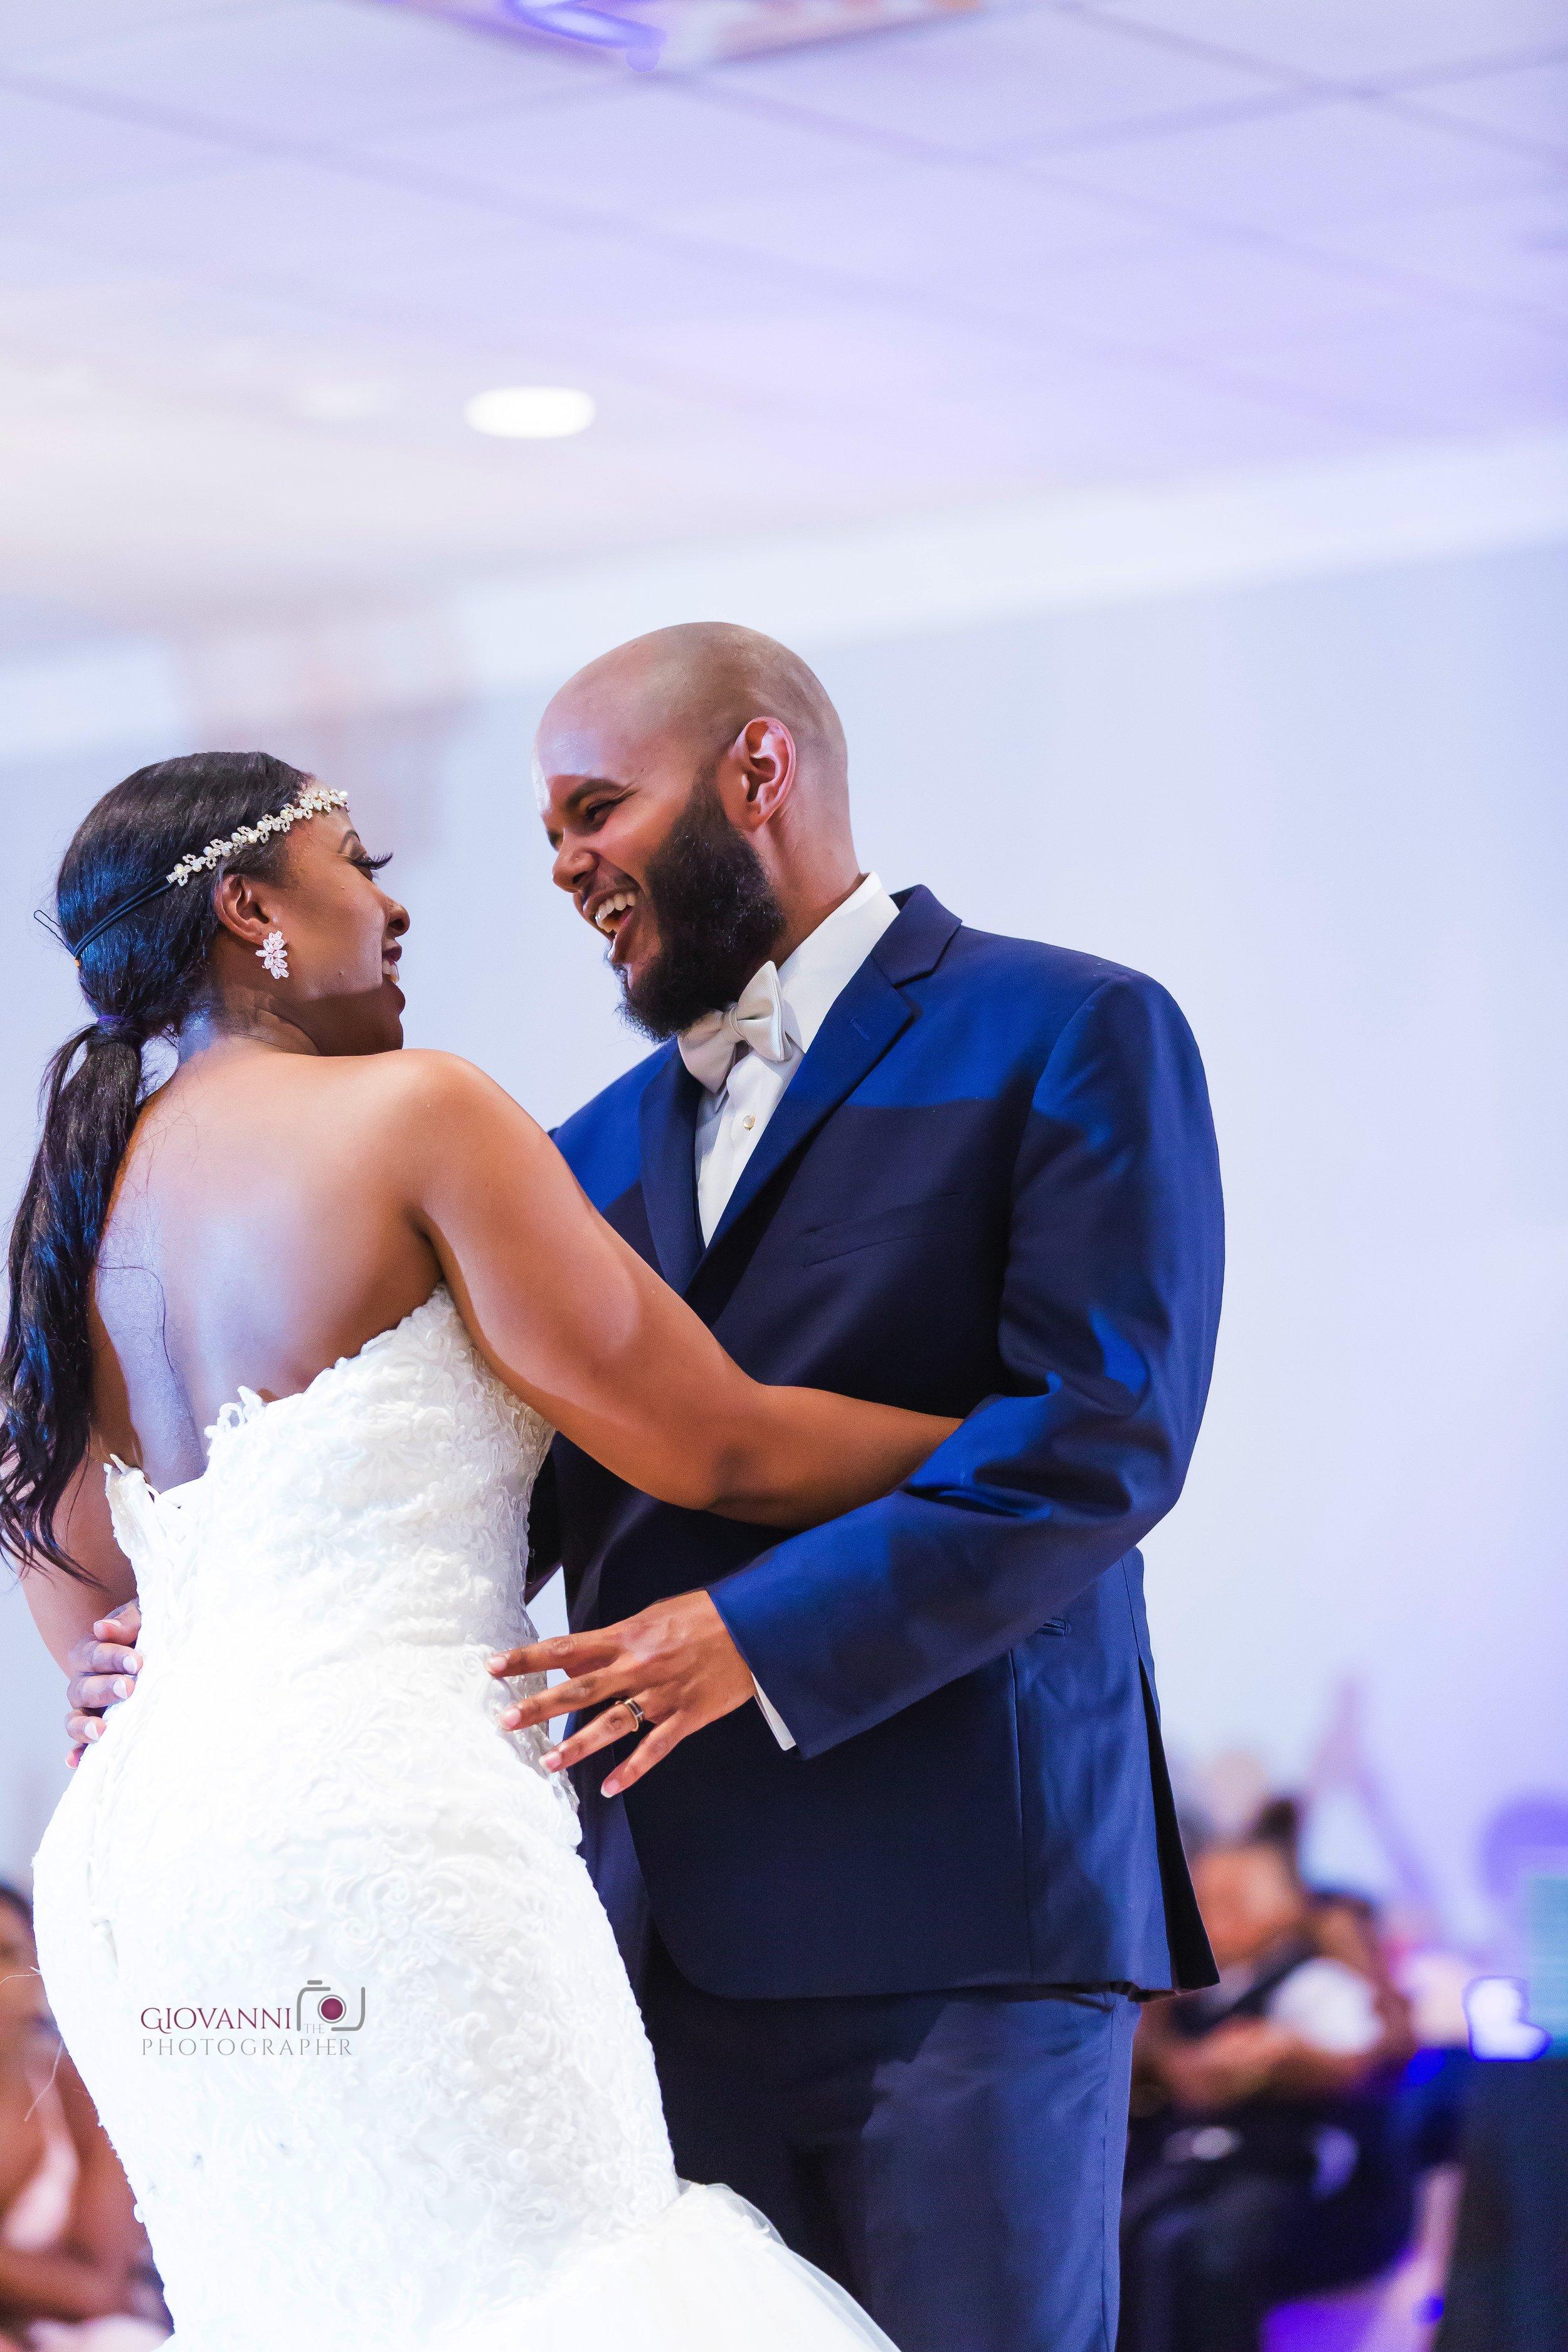 314A1290-Giovanni The Photographer-Best Boston Wedding Photography-Randolph Elks 2130 WM50.jpg